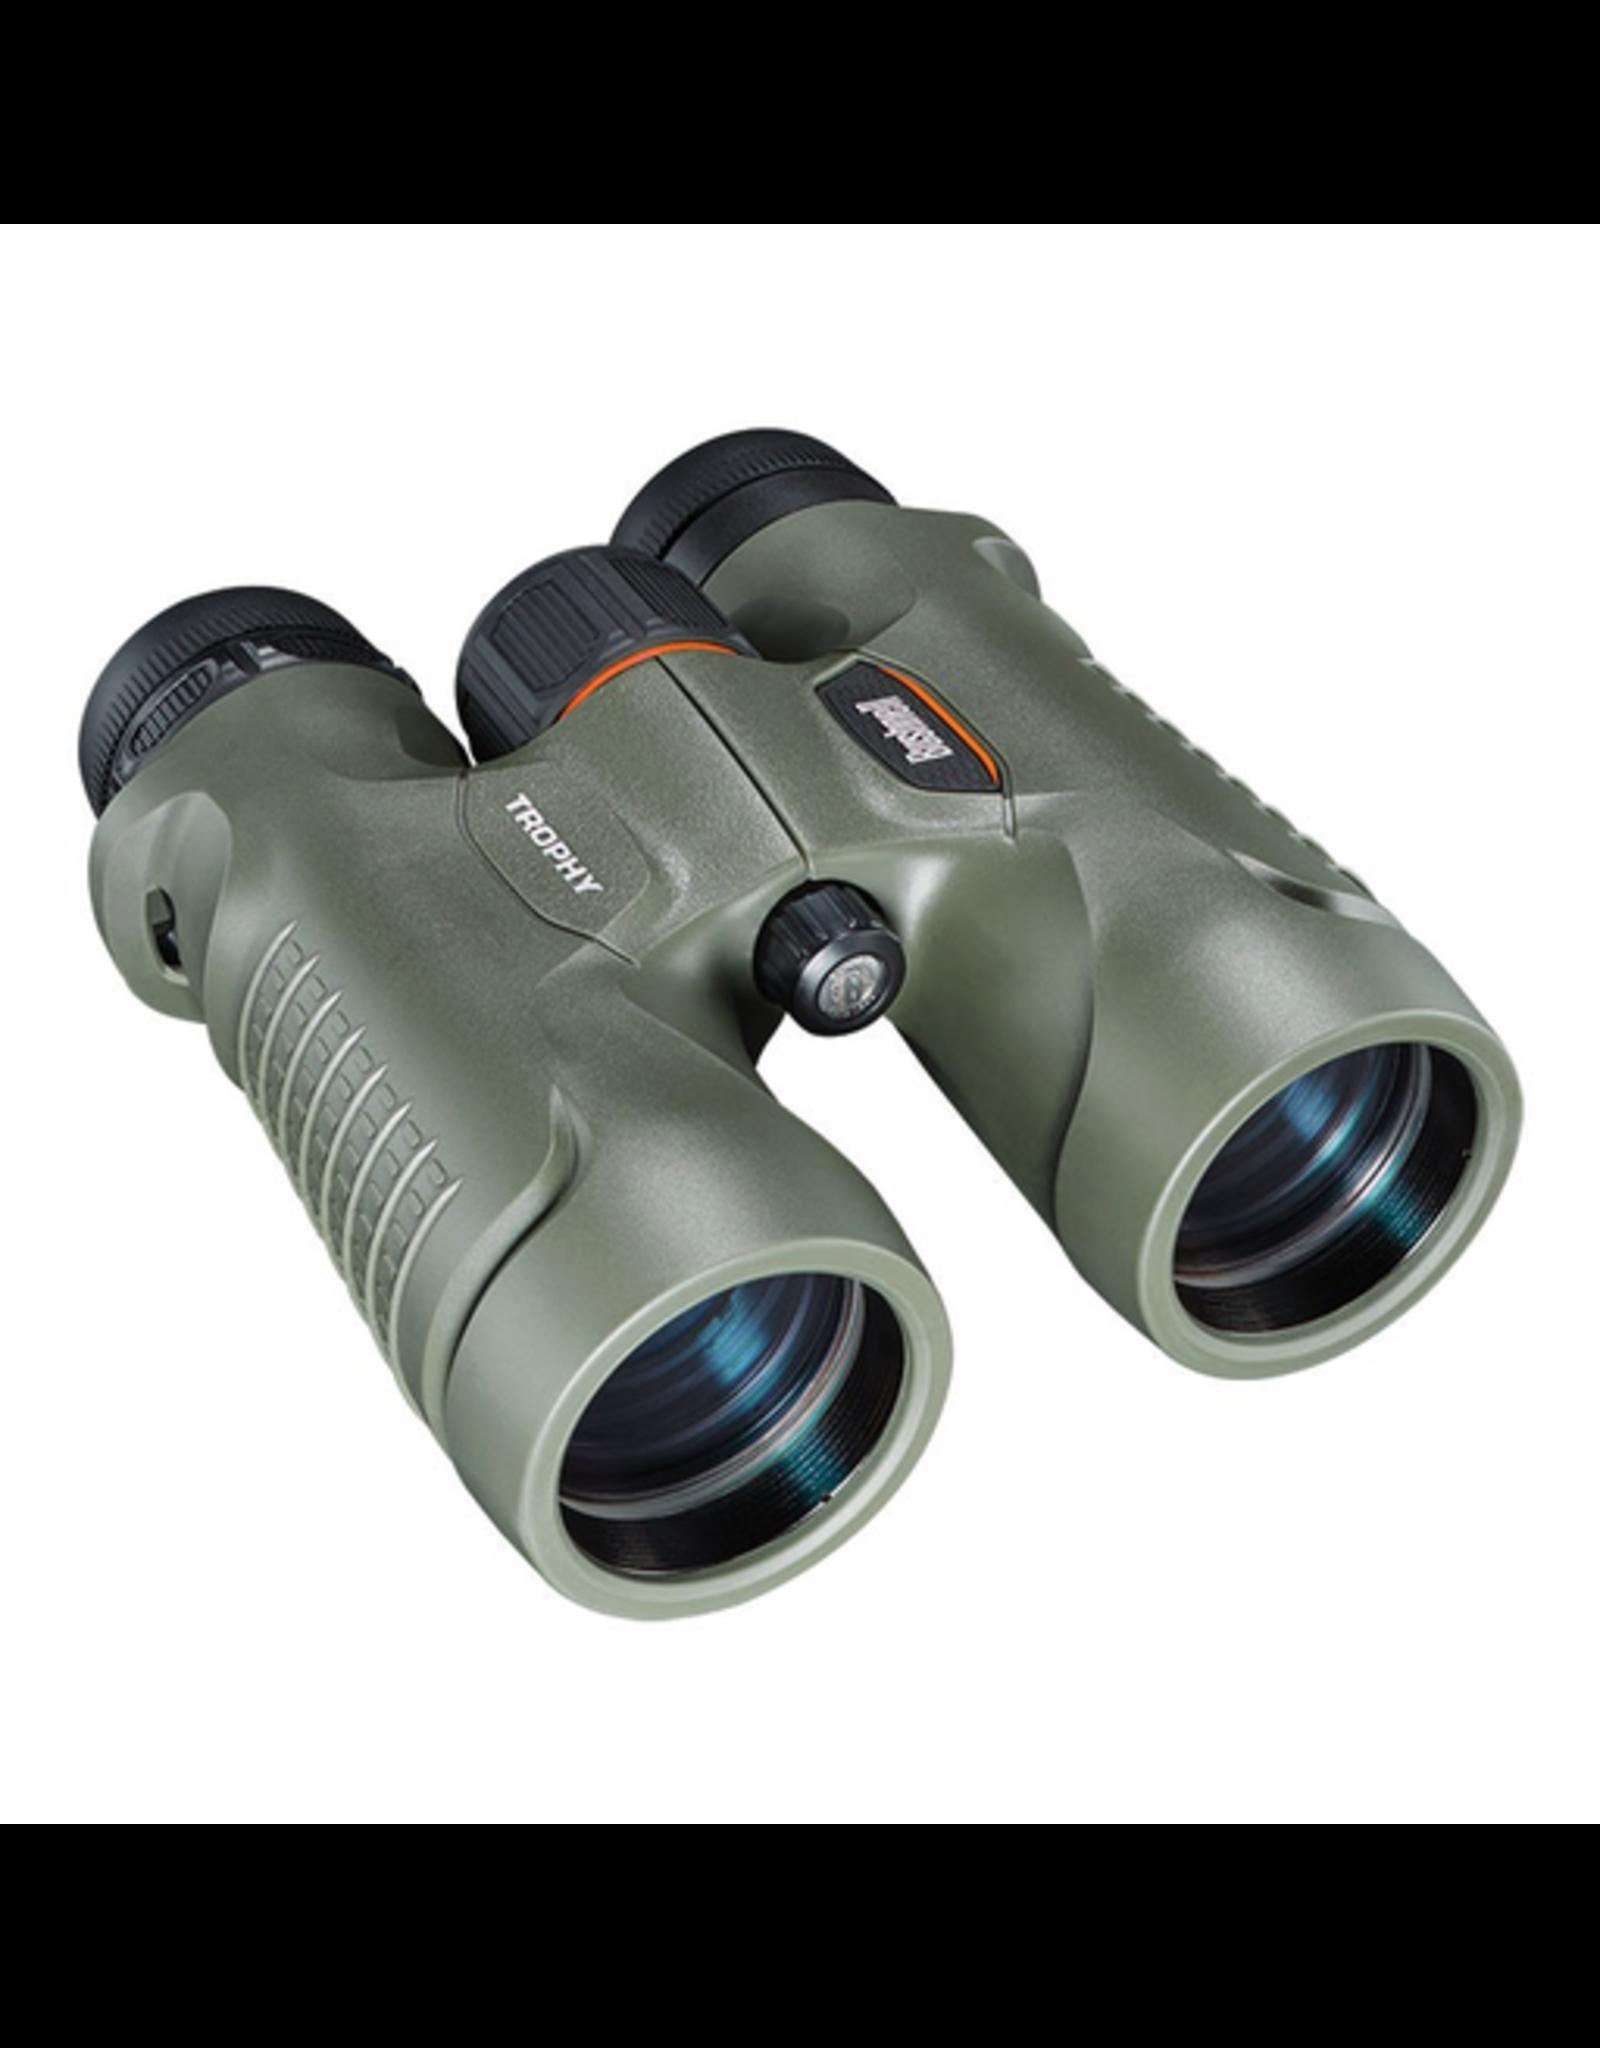 Bushnell Bushnell Trophy Bone Collector Edition Warerproof Binoculars, 10 x 42 mm